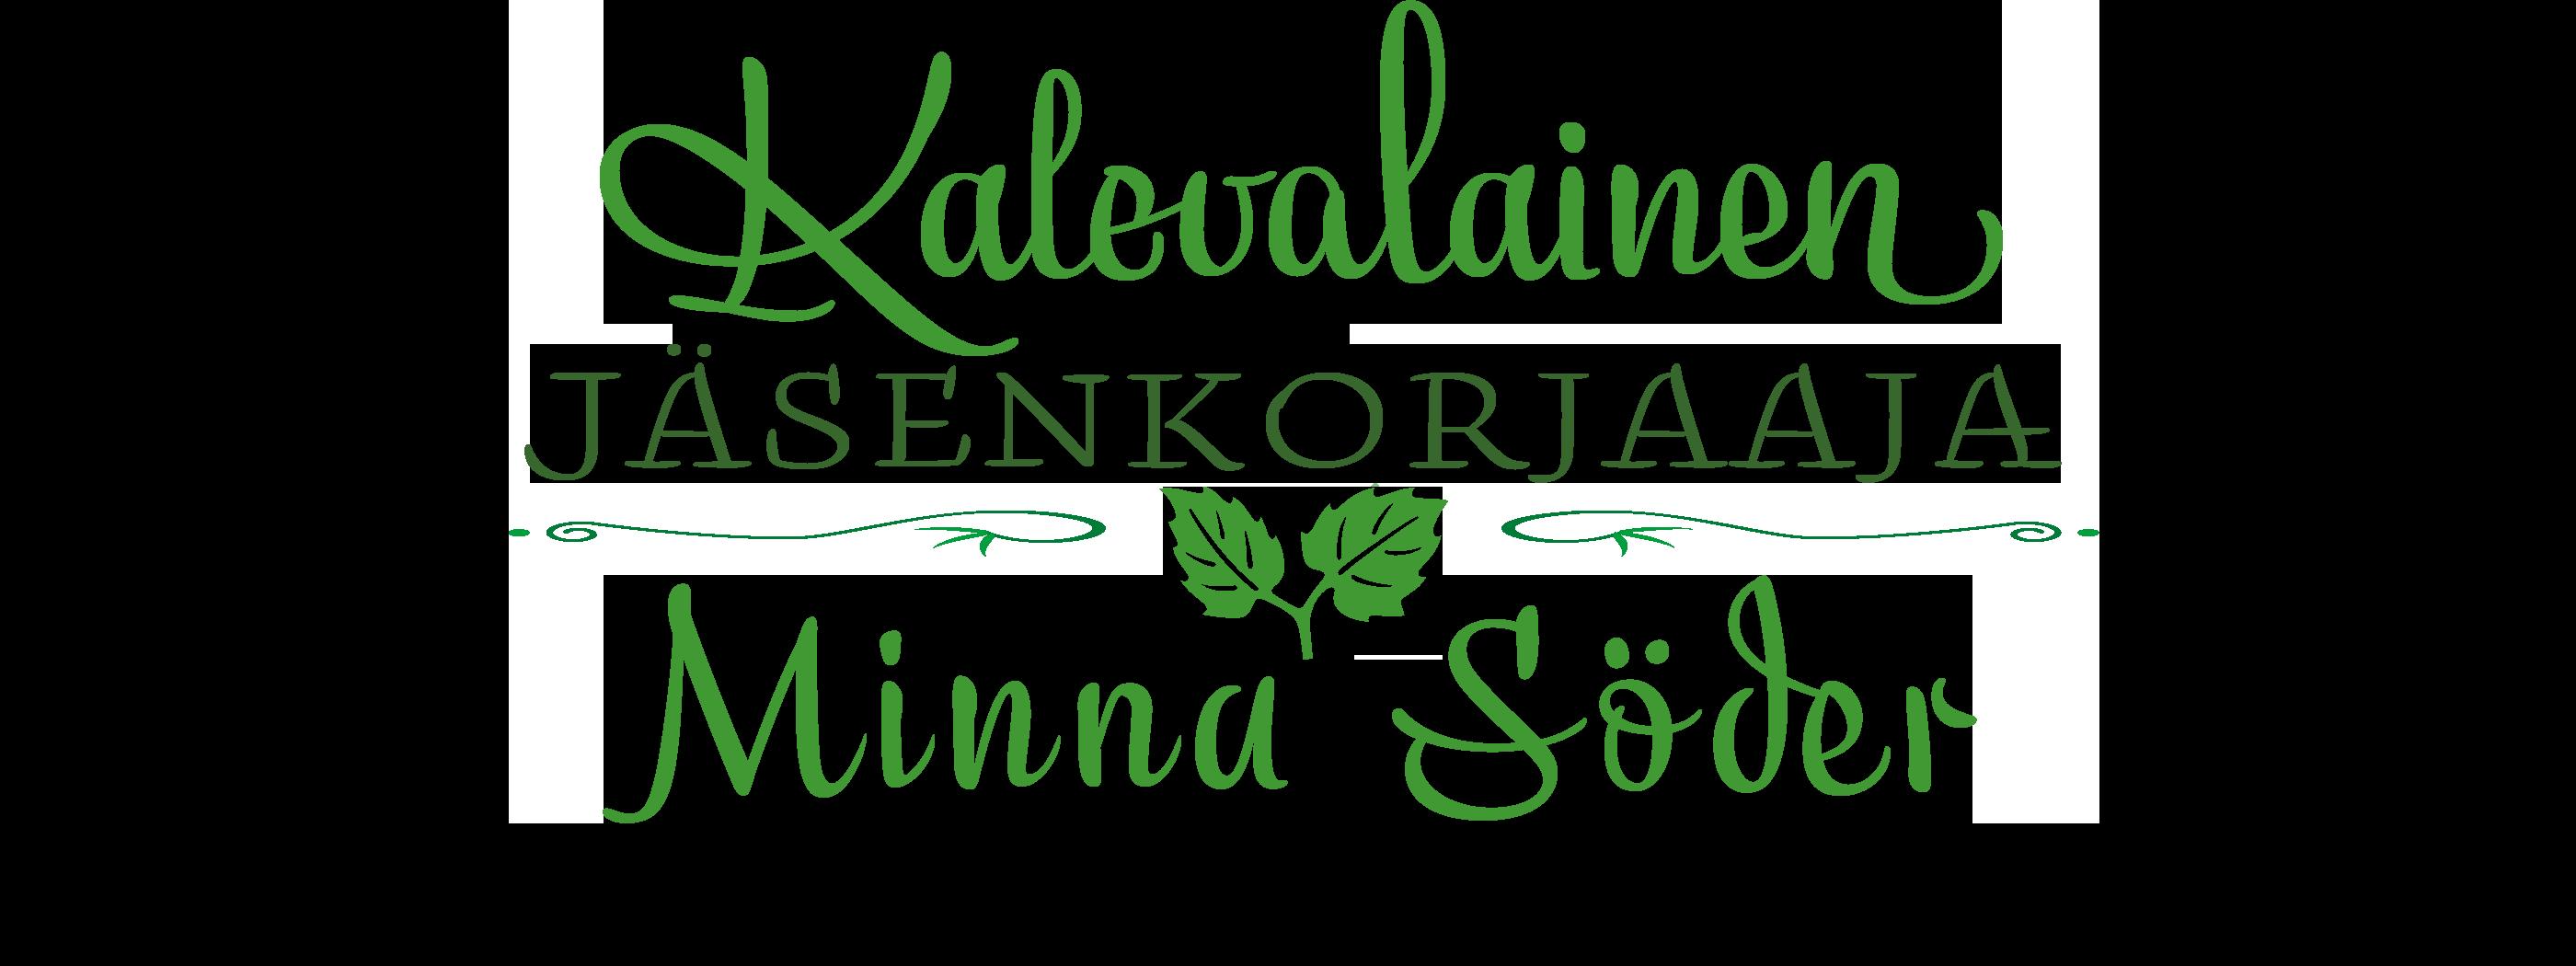 Minna_logo_vihreä